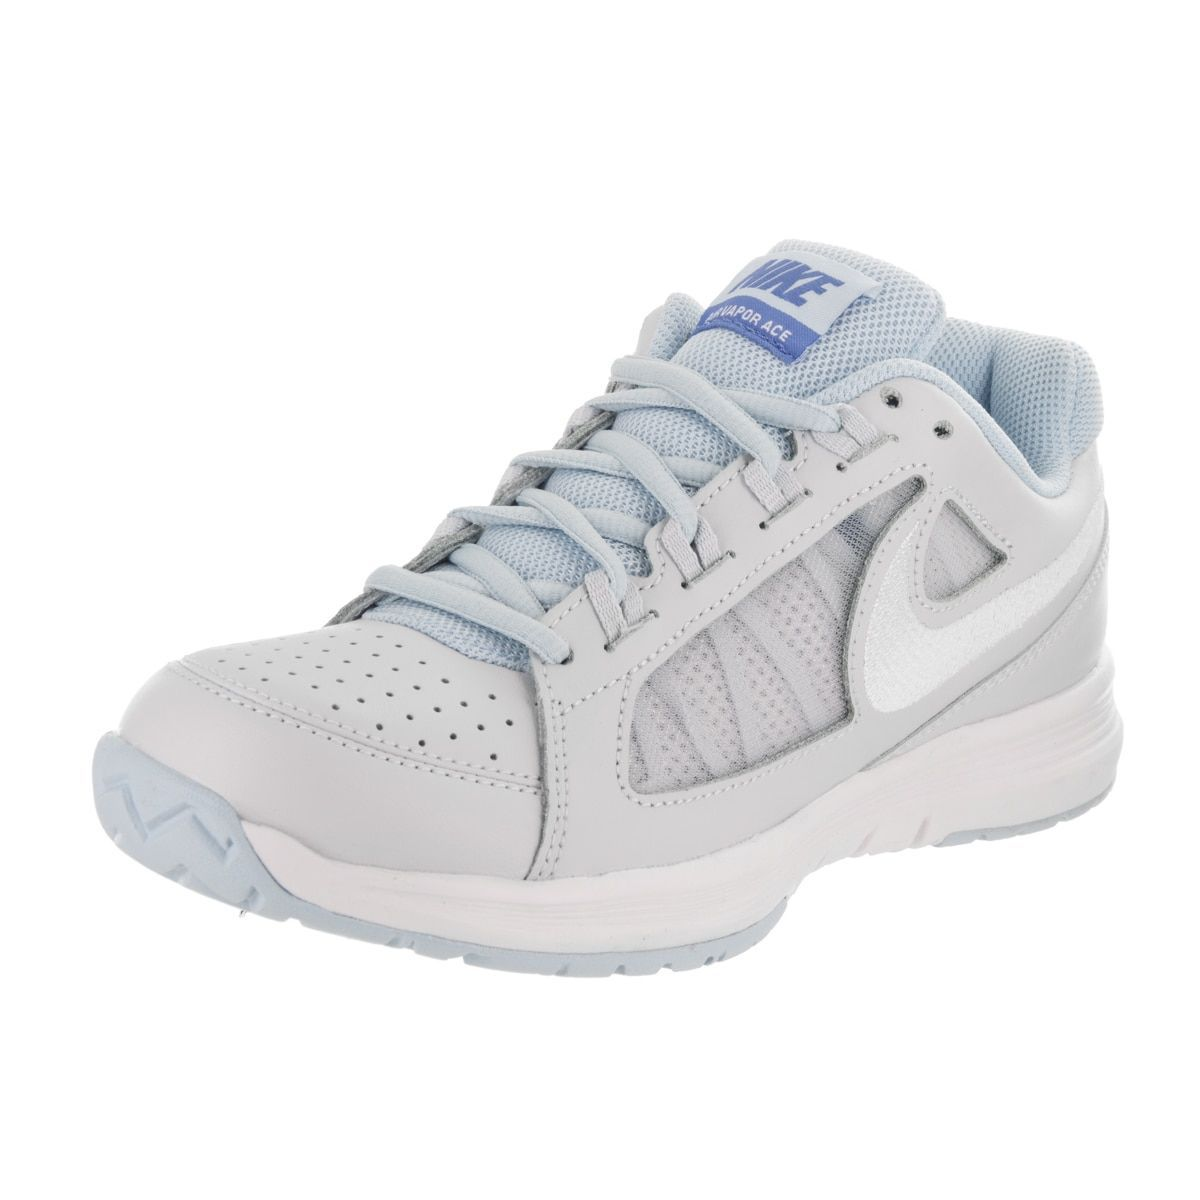 3a132739e387 Nike Women s Air Vapor Ace Tennis Shoe